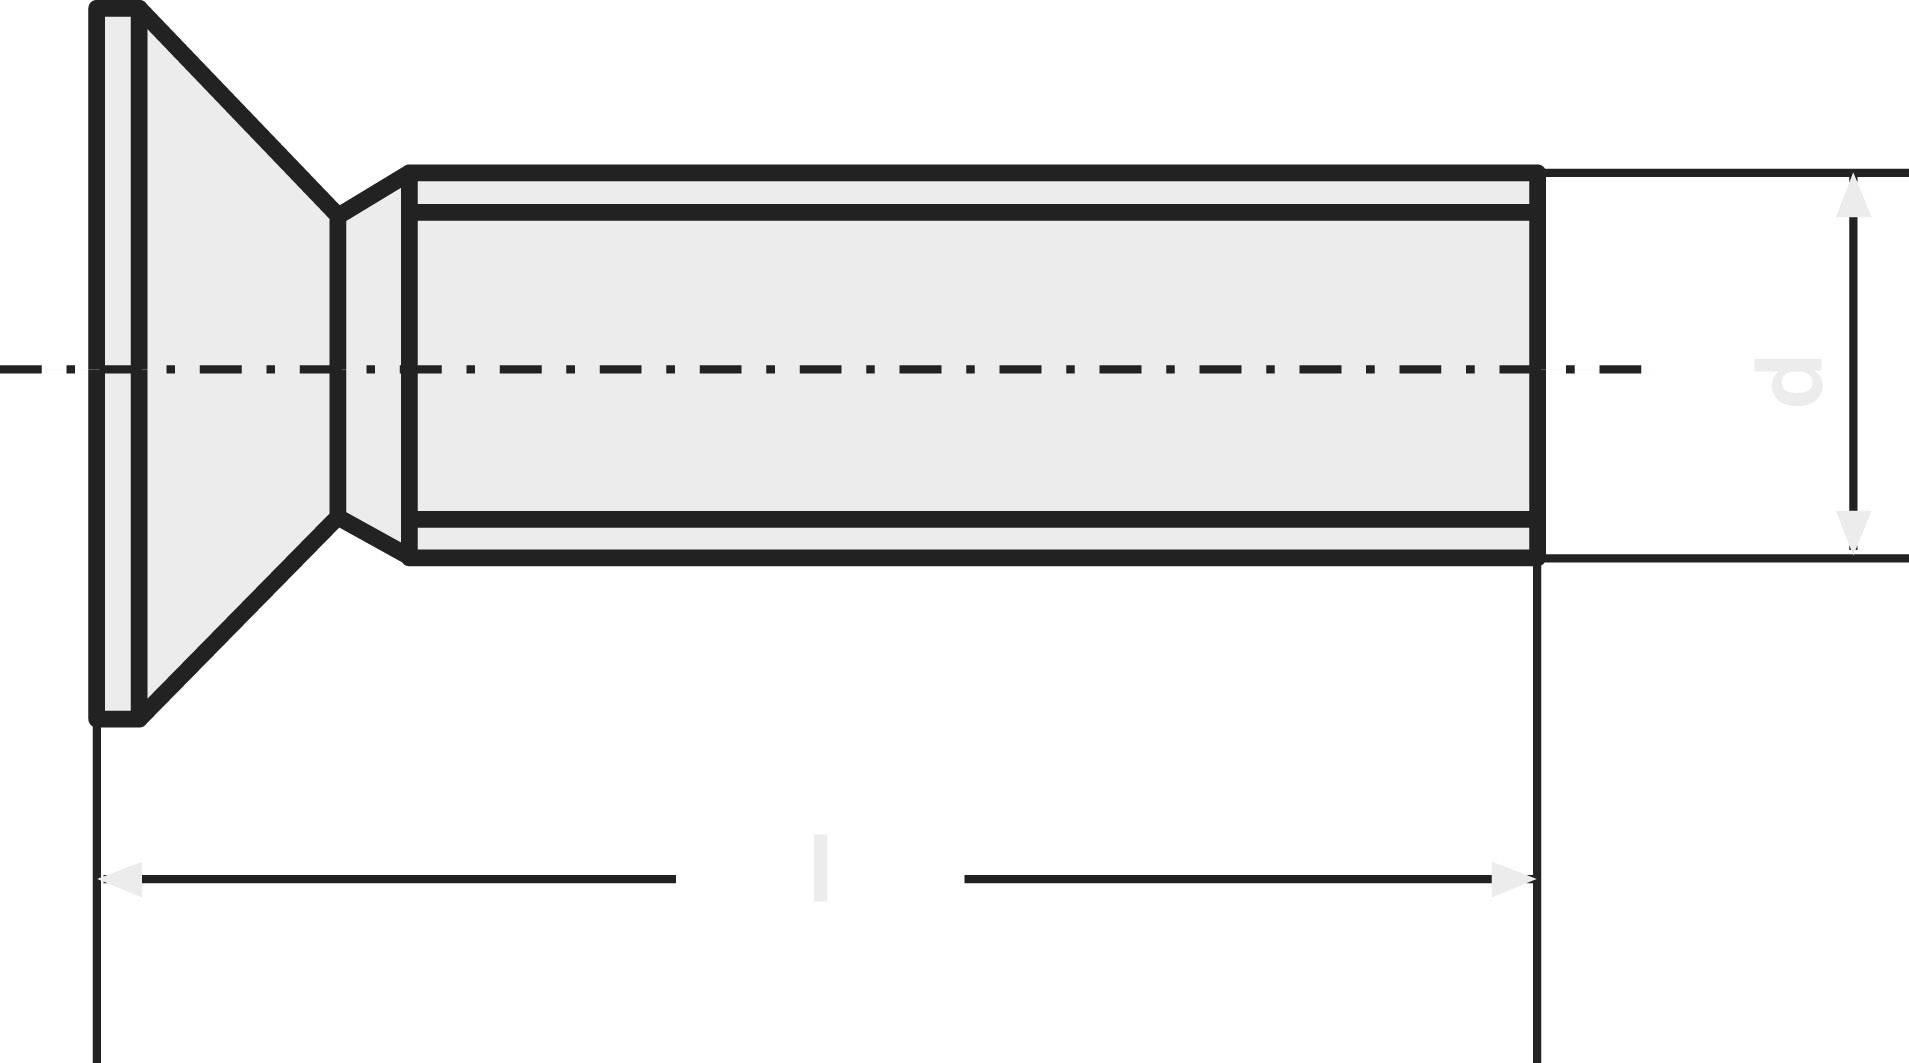 M2 Innensechskantschrauben Set 800 Teile Edelstahl A2 DIN 912